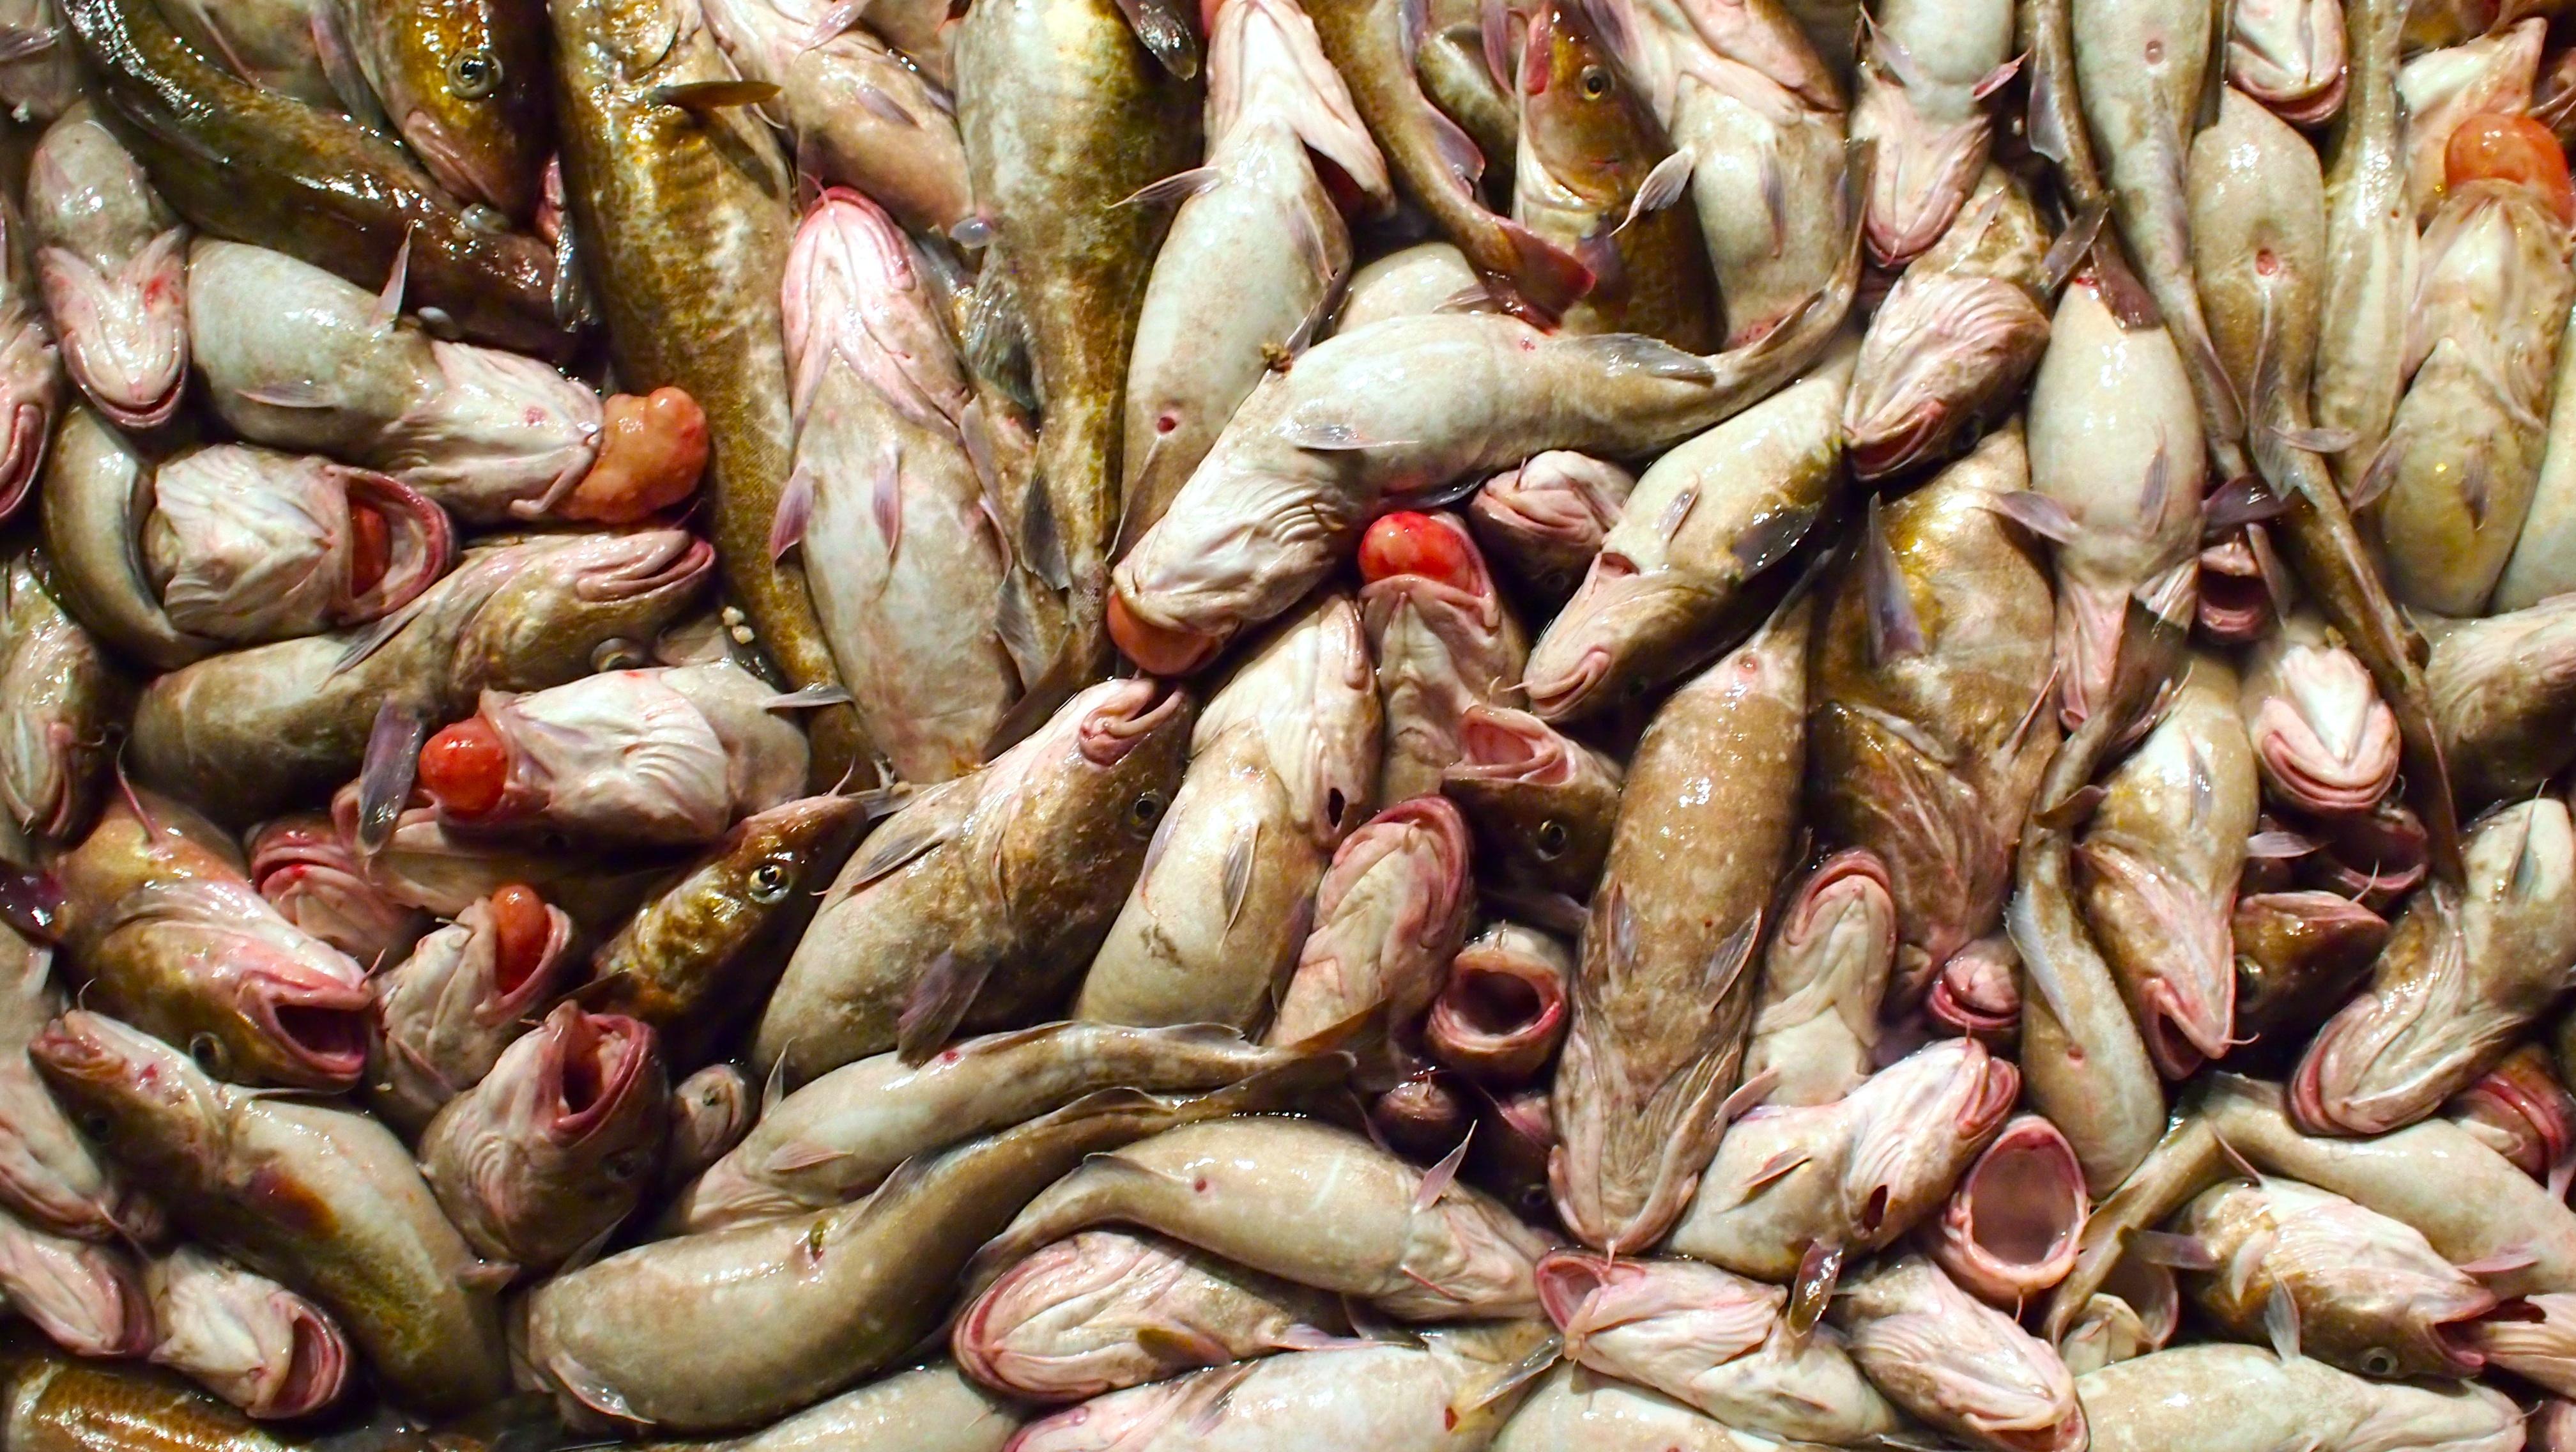 Methylmercury in fish fdating